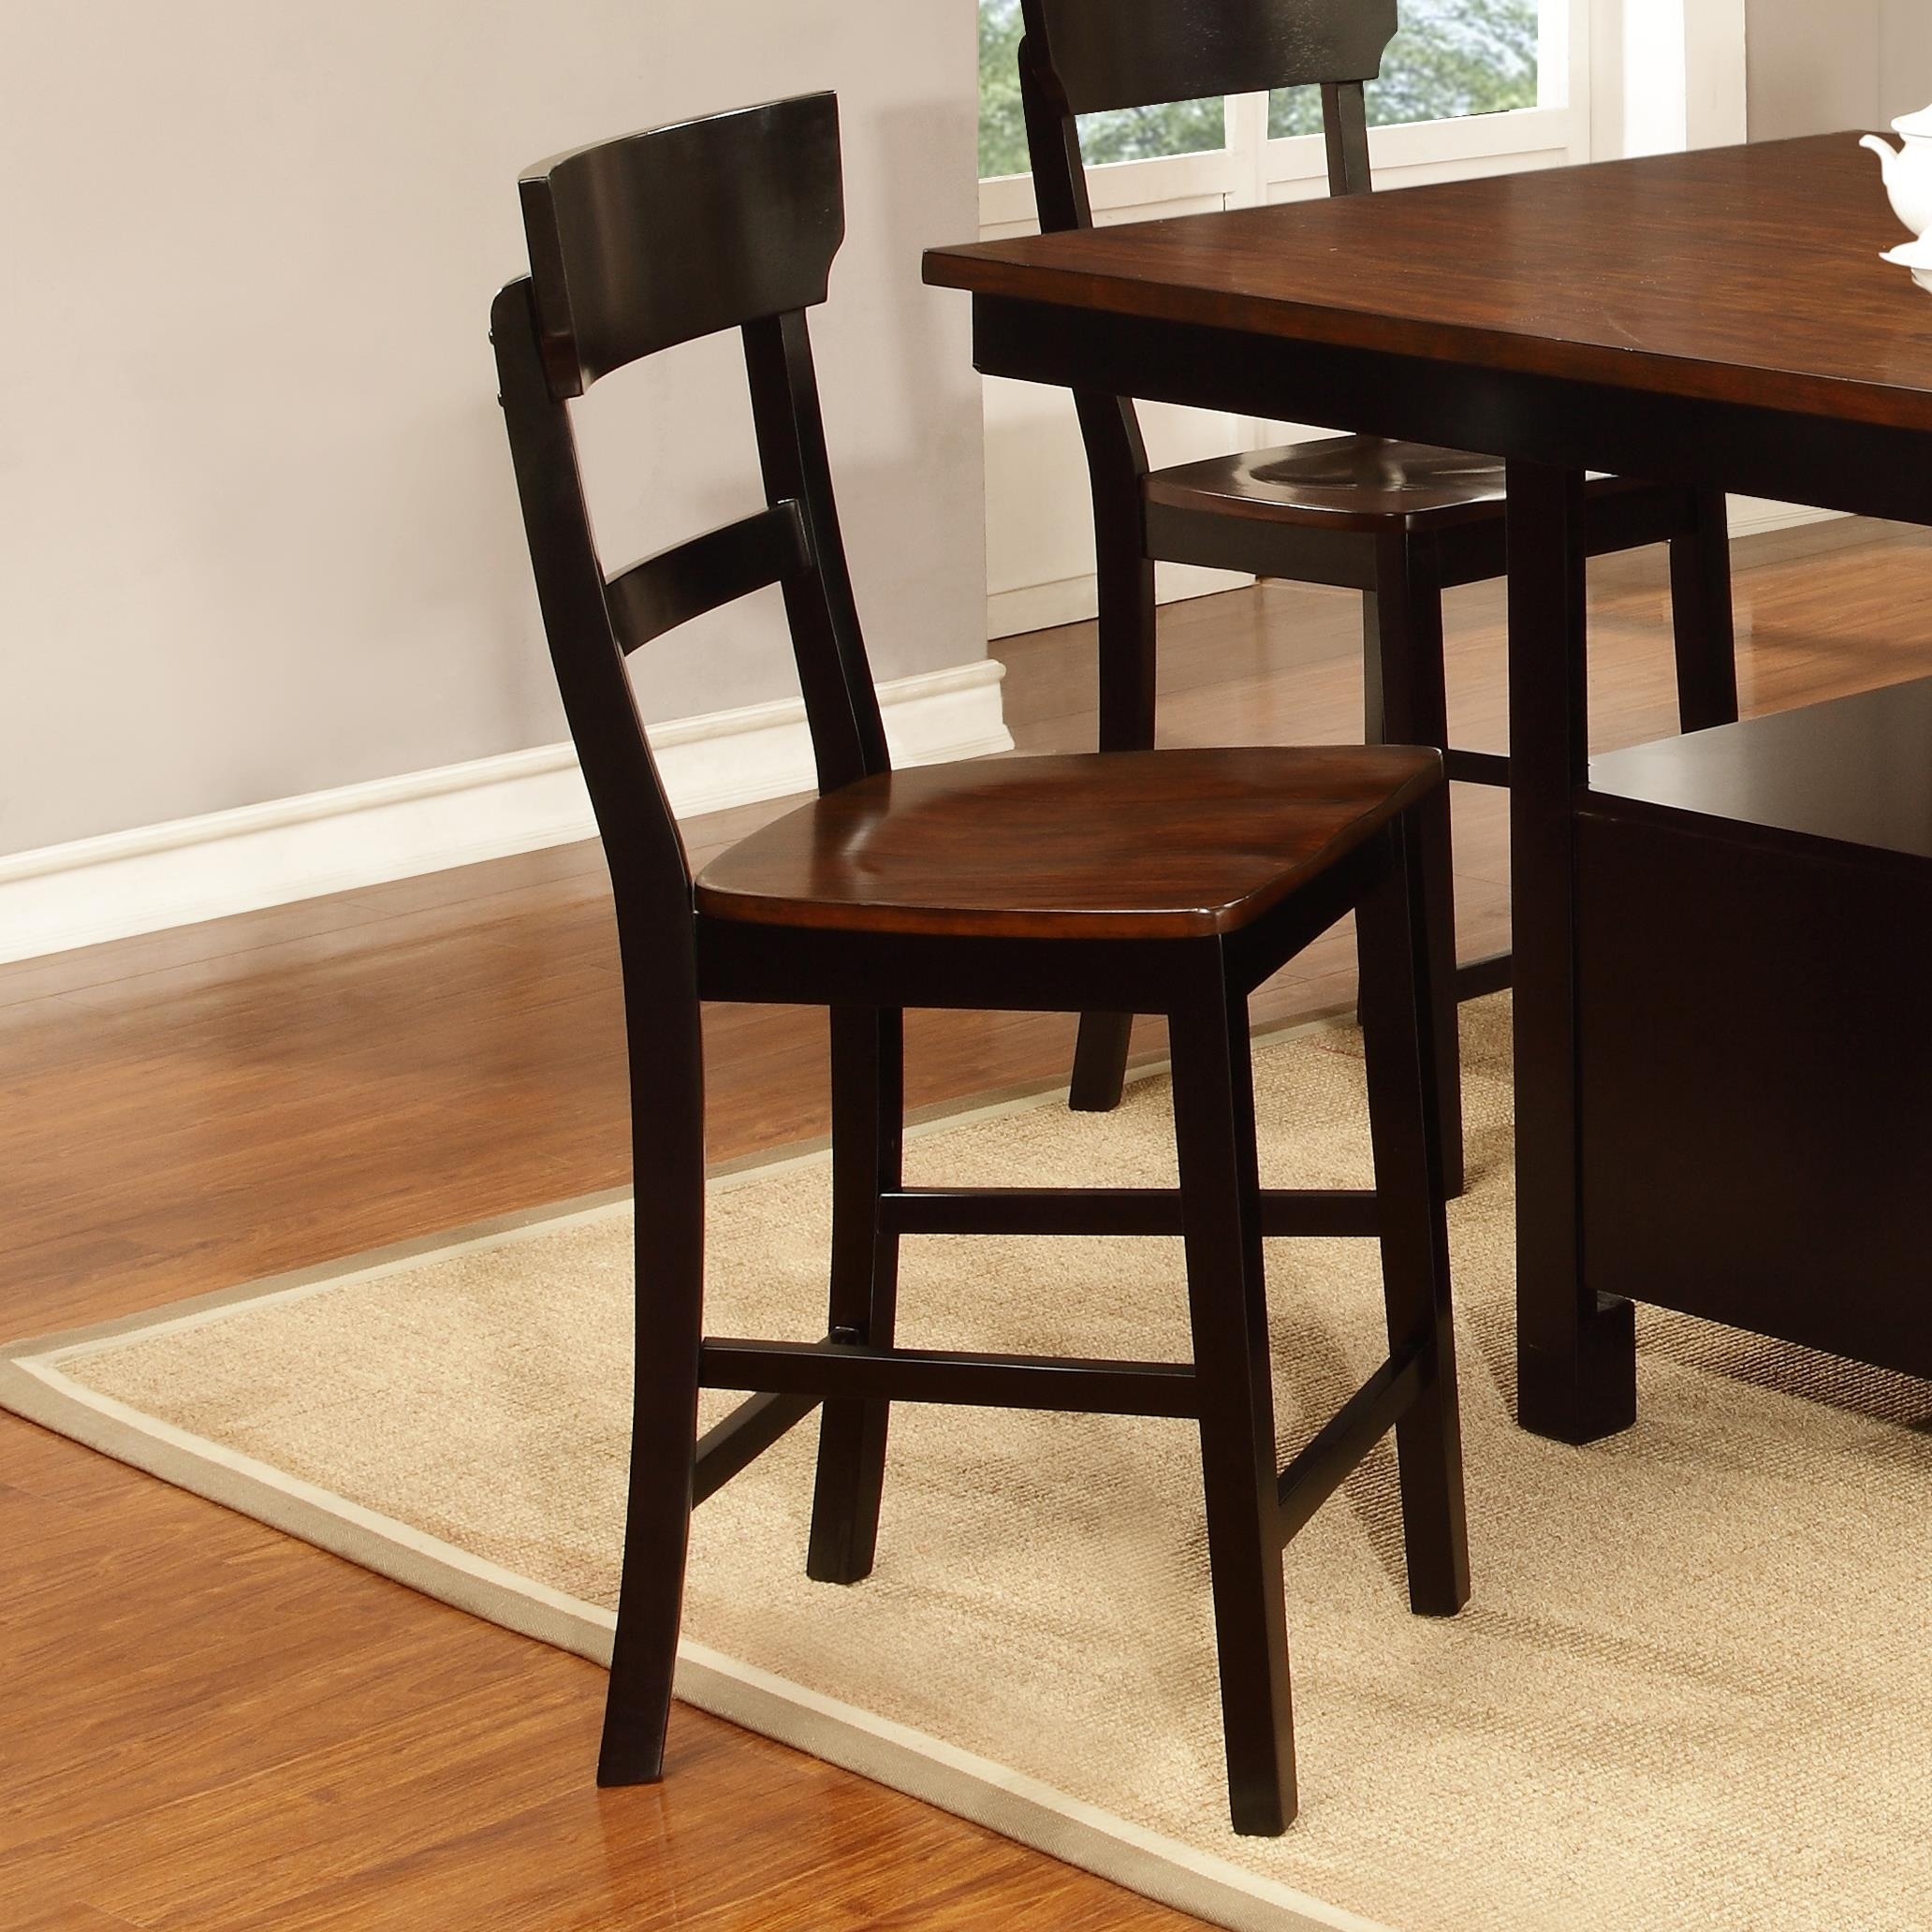 "Lifestyle DC393 30"" Pub Chair Royal Furniture Bar Stool"